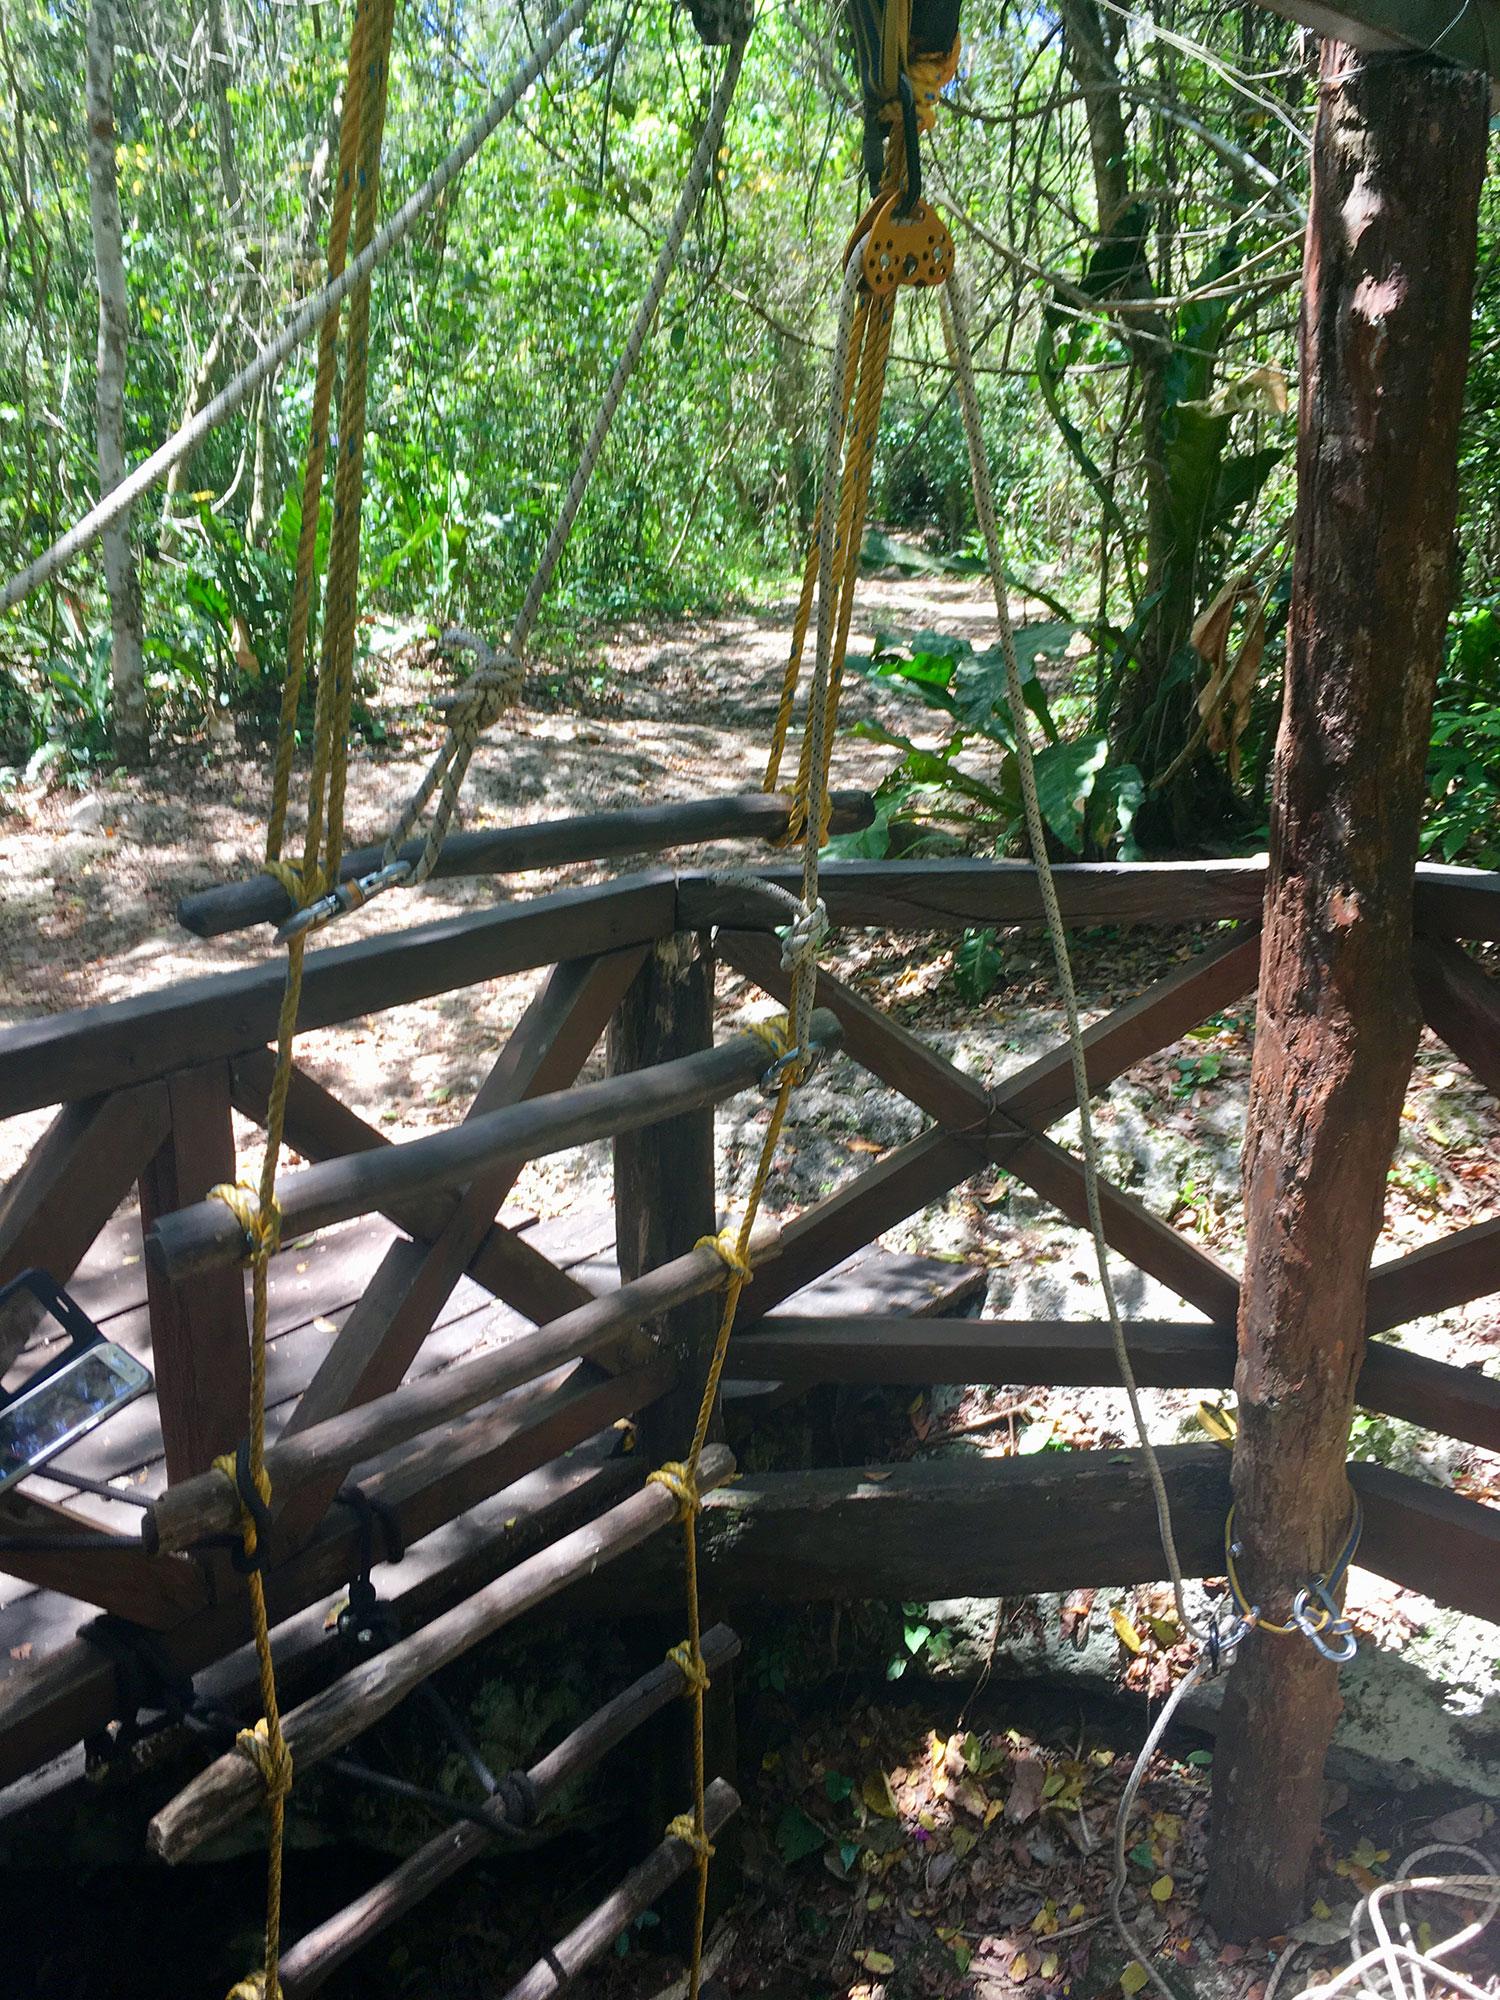 Hammocks_and_Ruins_What_to_Do_Yucatan_jungle_lake_Punta_Laguna_monkey_spider_howler_in_the_wild_12.jpg